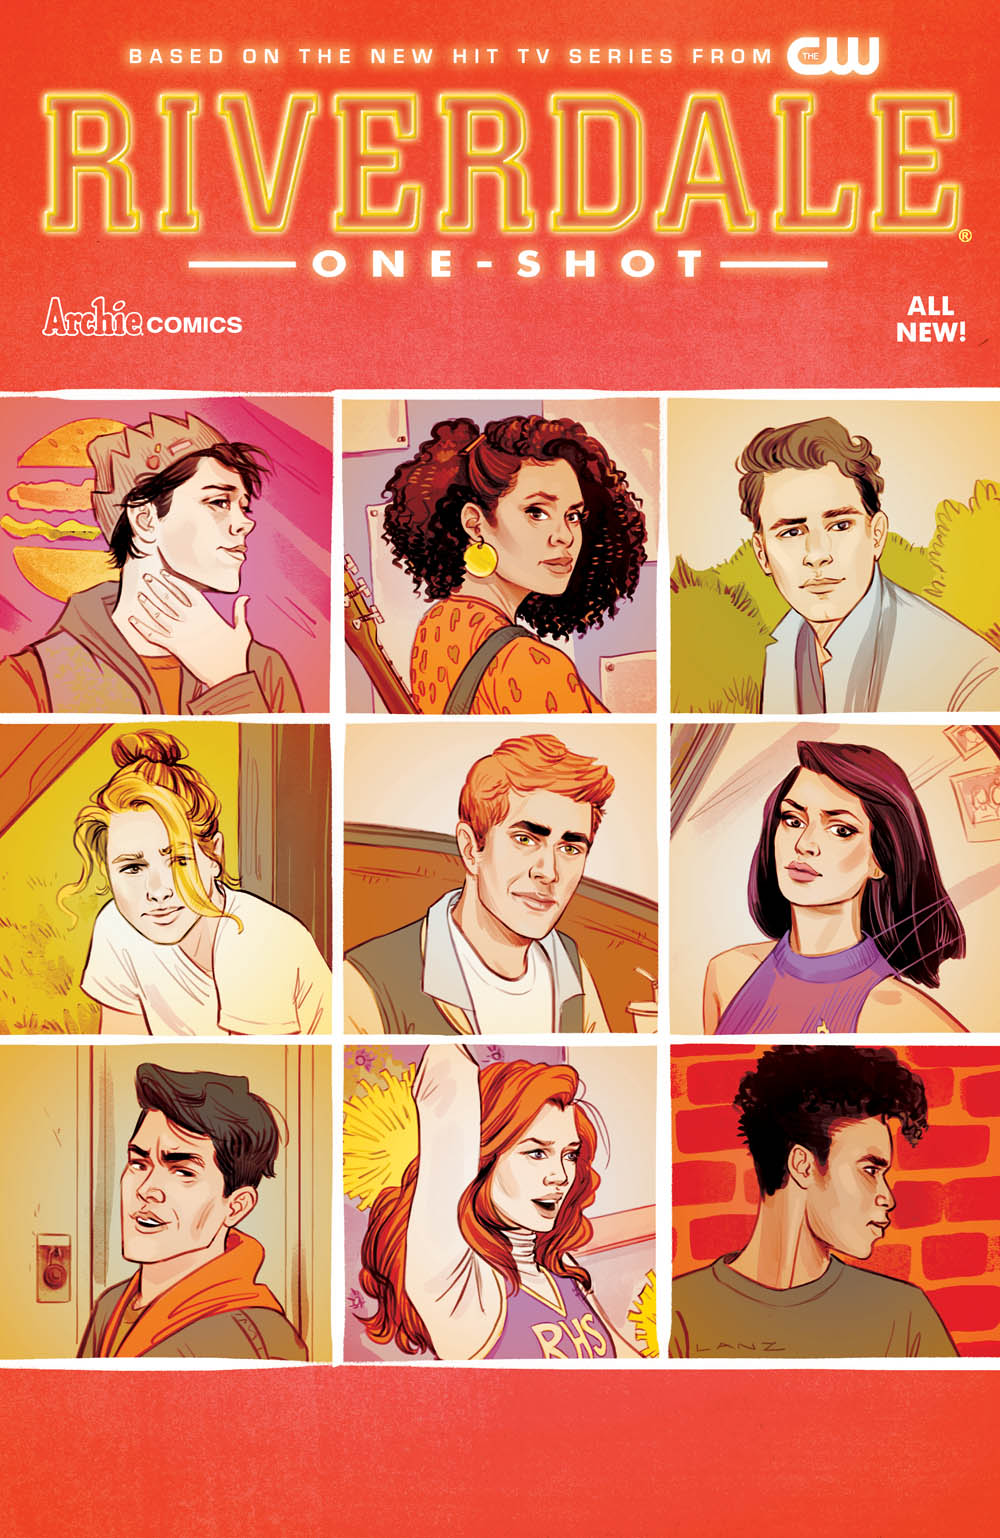 Archie Preview Riverdale One Shot Aipt